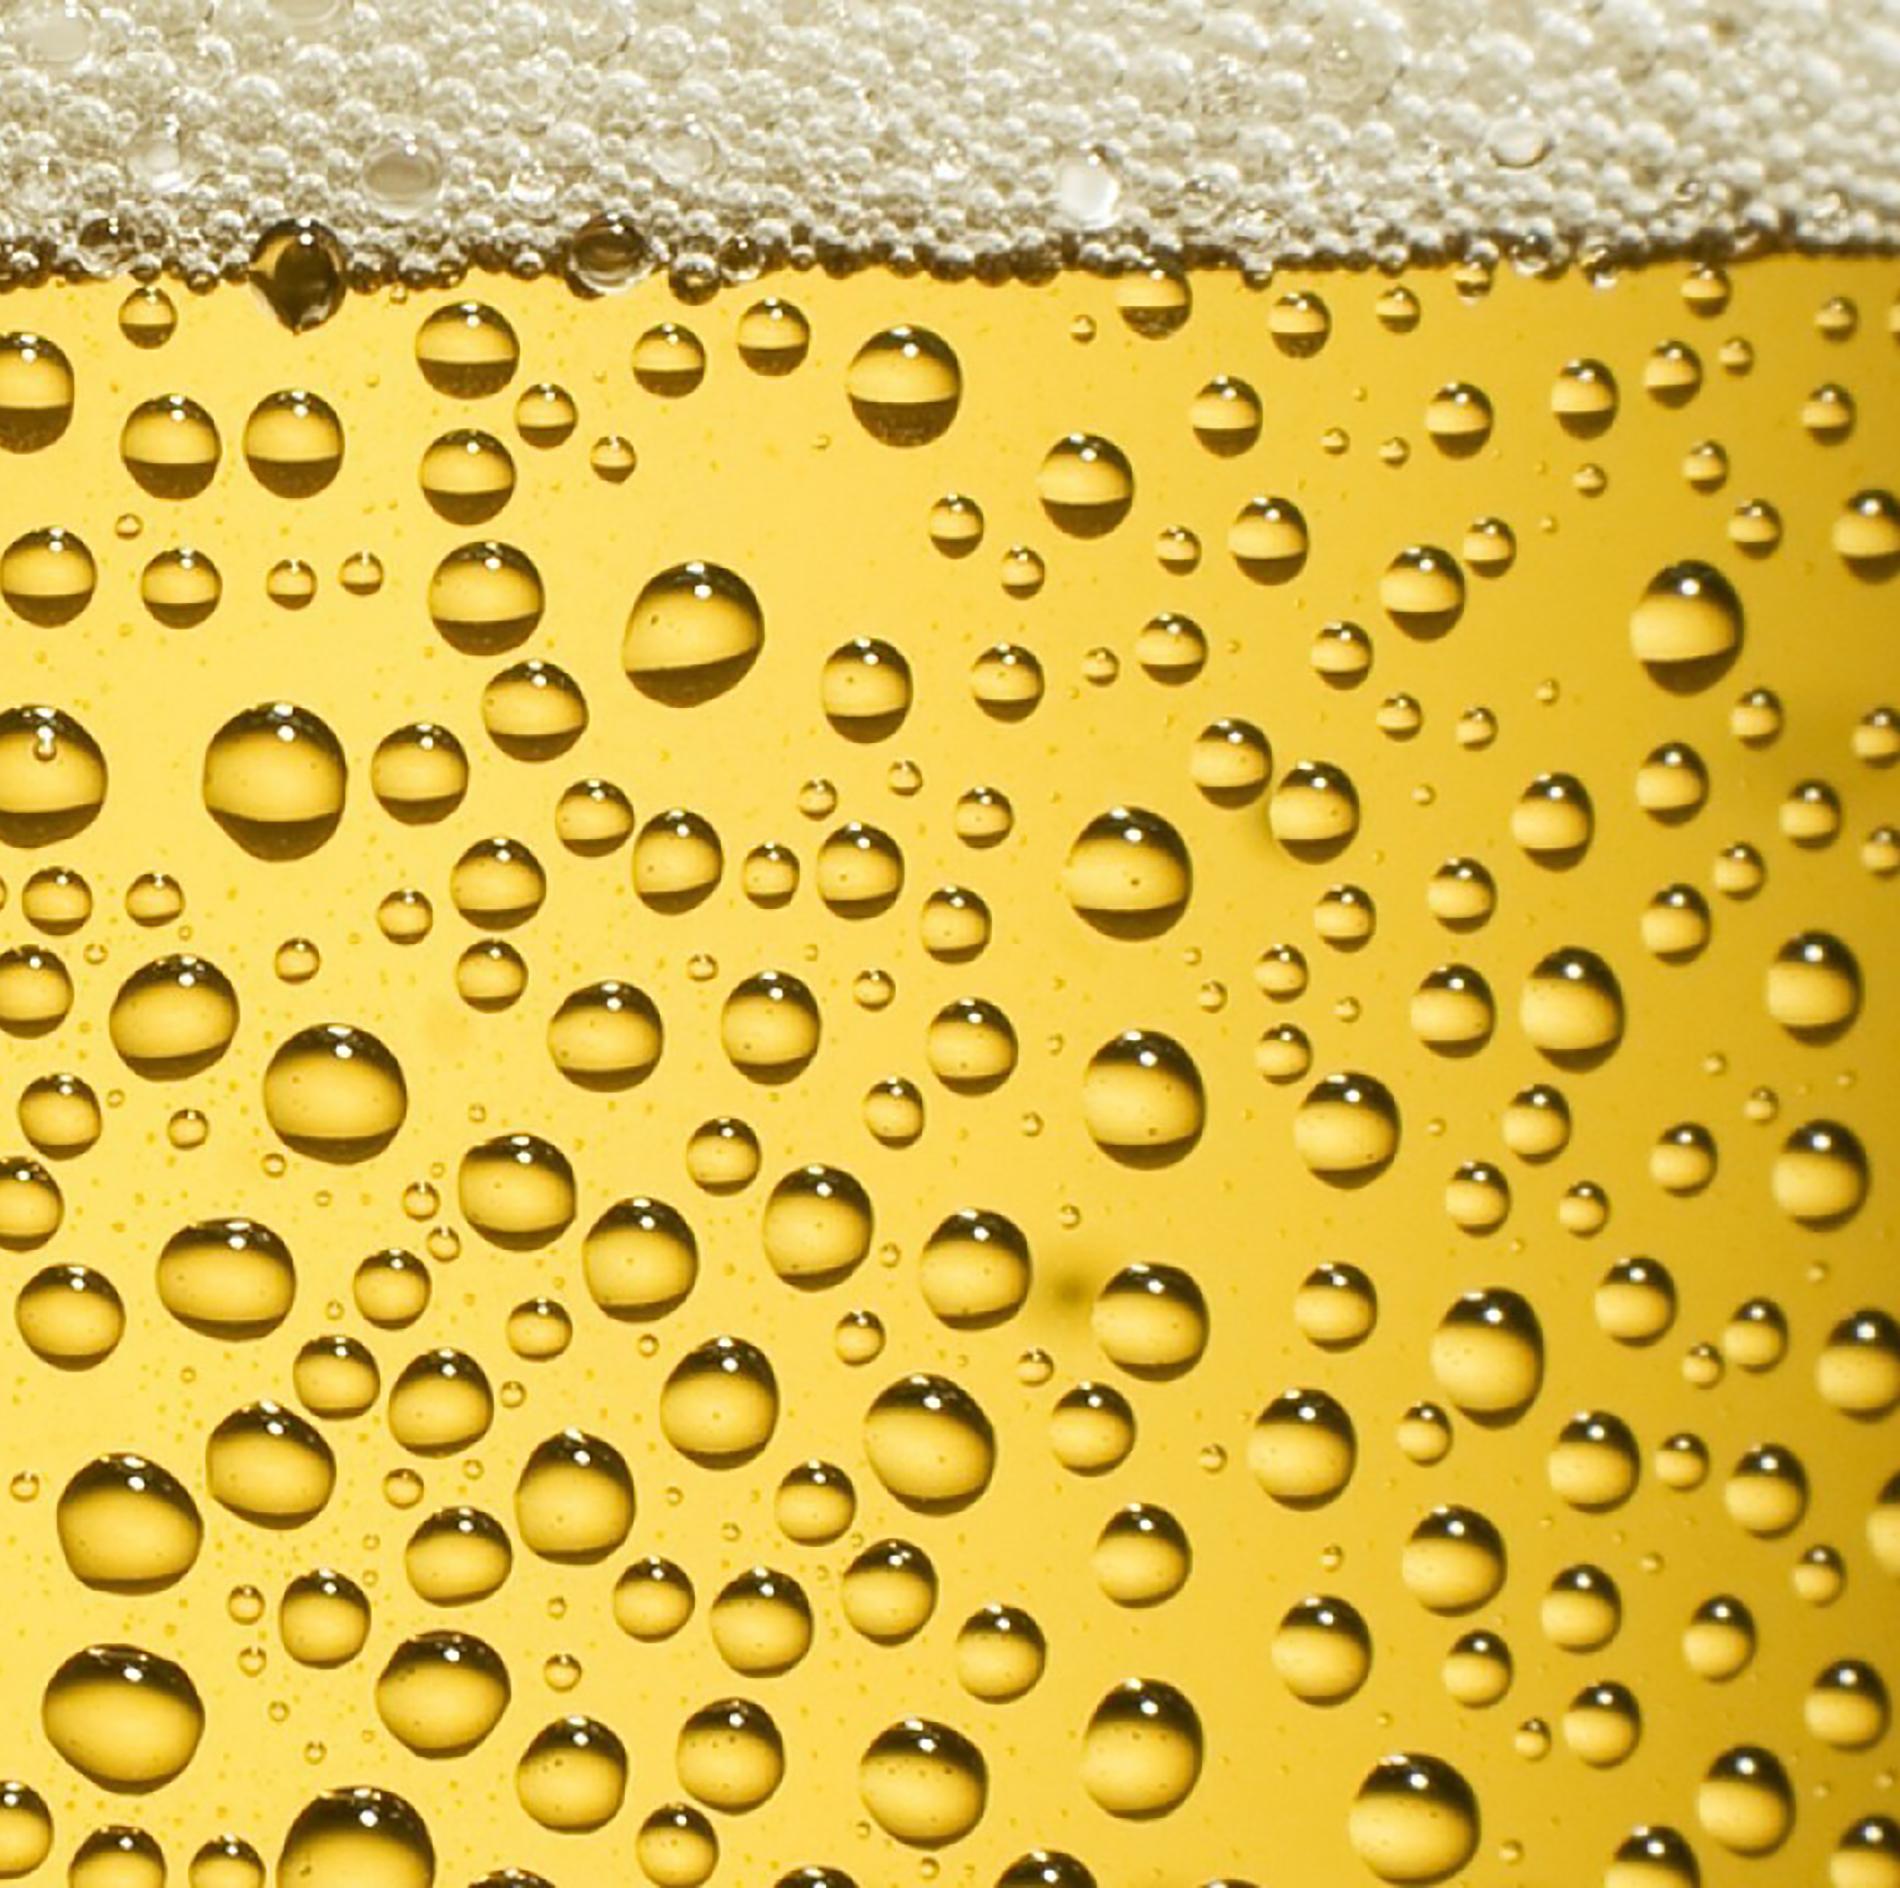 776755bdadd586026832b89e1101e4811d976_Nutty-Irishman-Craft-Beer2.jpg